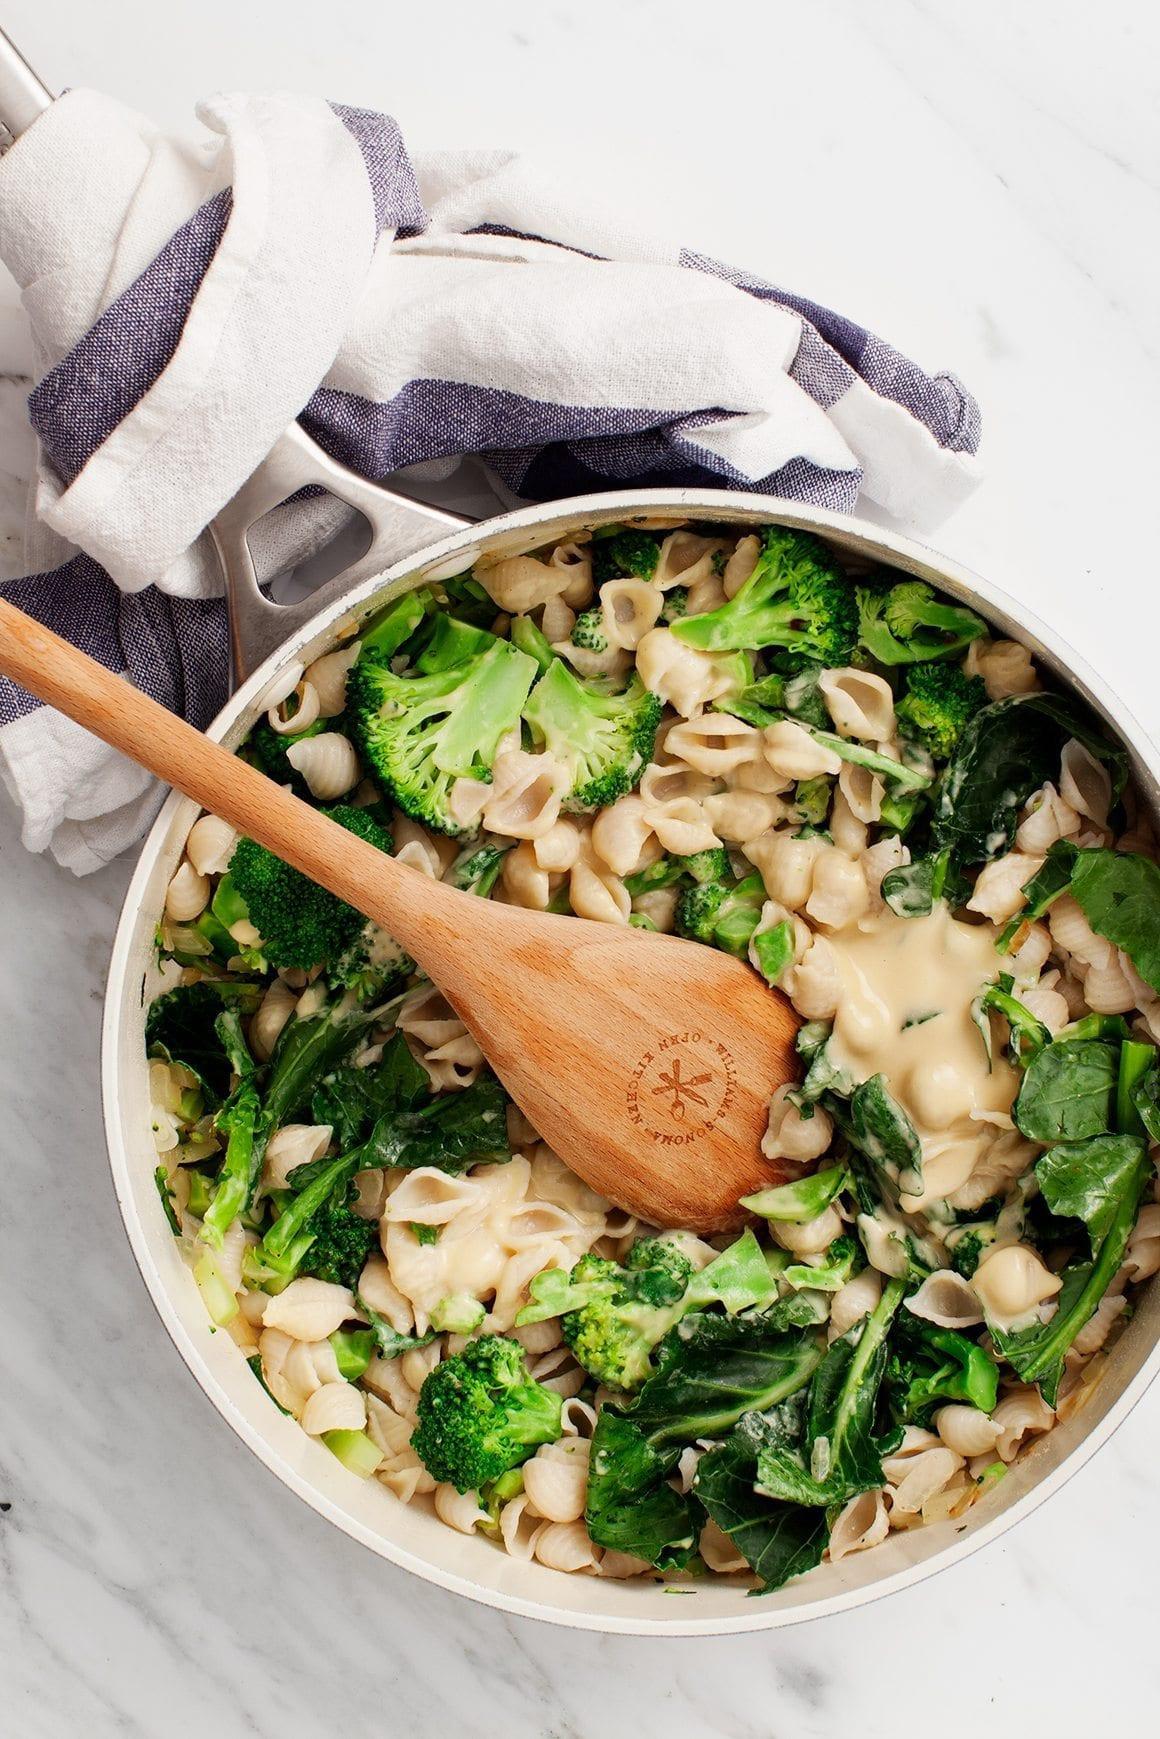 Healthy Vegan Dinner  Healthy Ve arian Dinner Recipes Love and Lemons